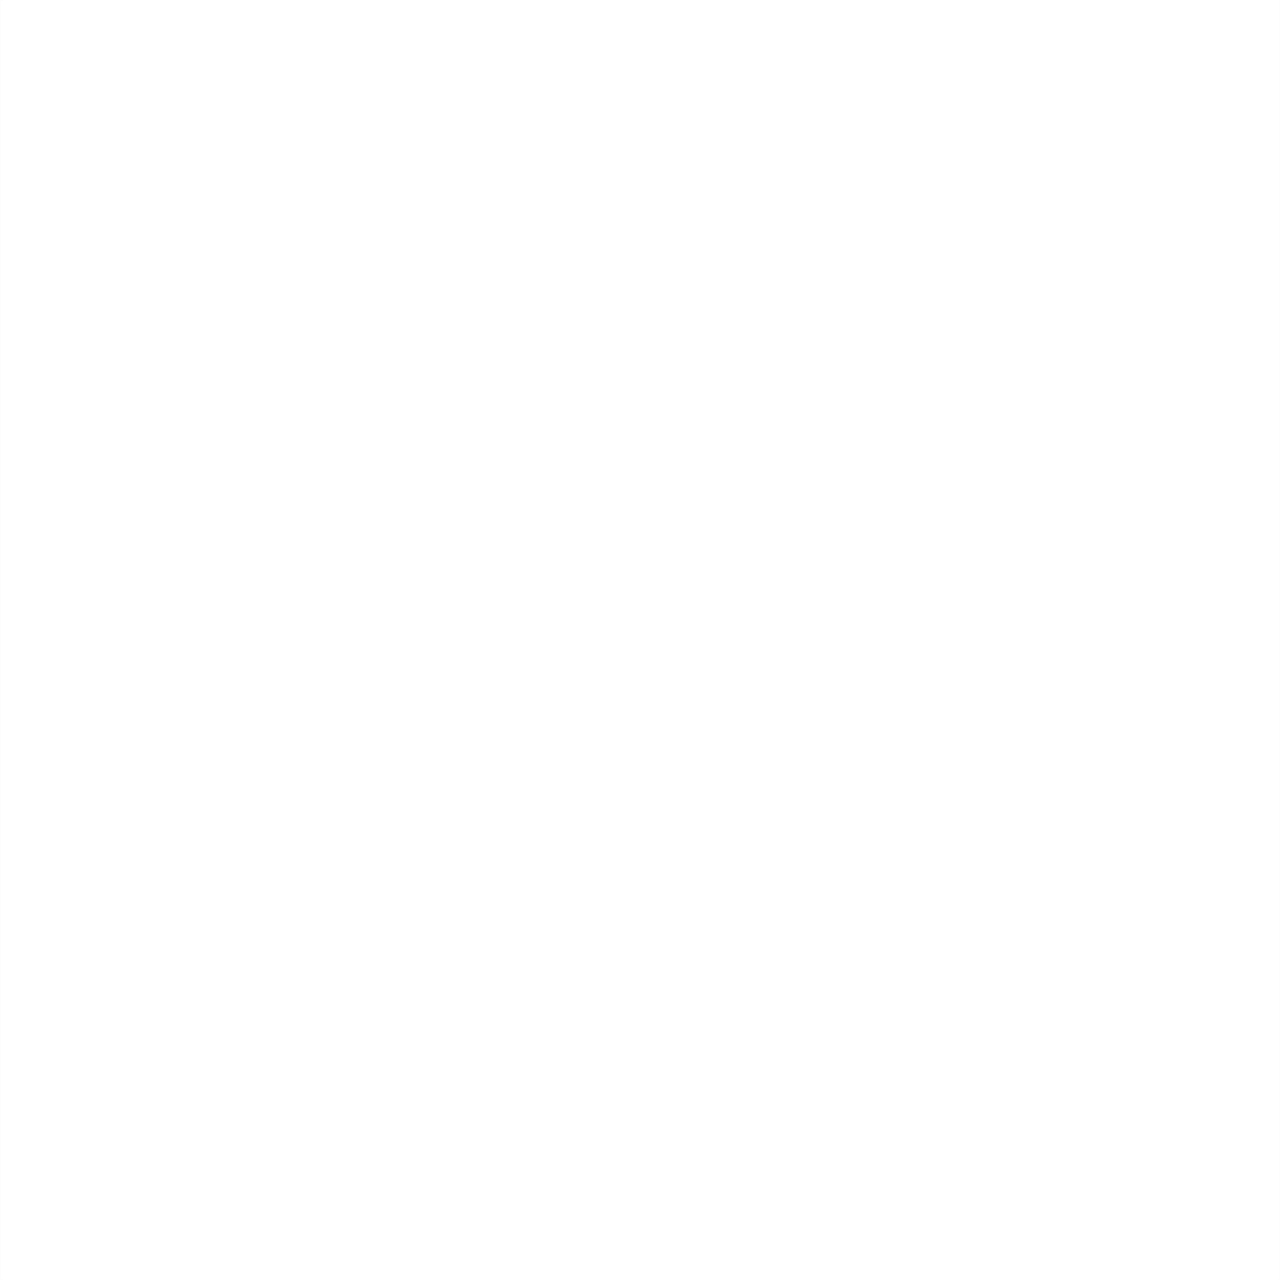 Алюкобонд белый 8807 (3мм/18мкм) 1,22мХ4,00м